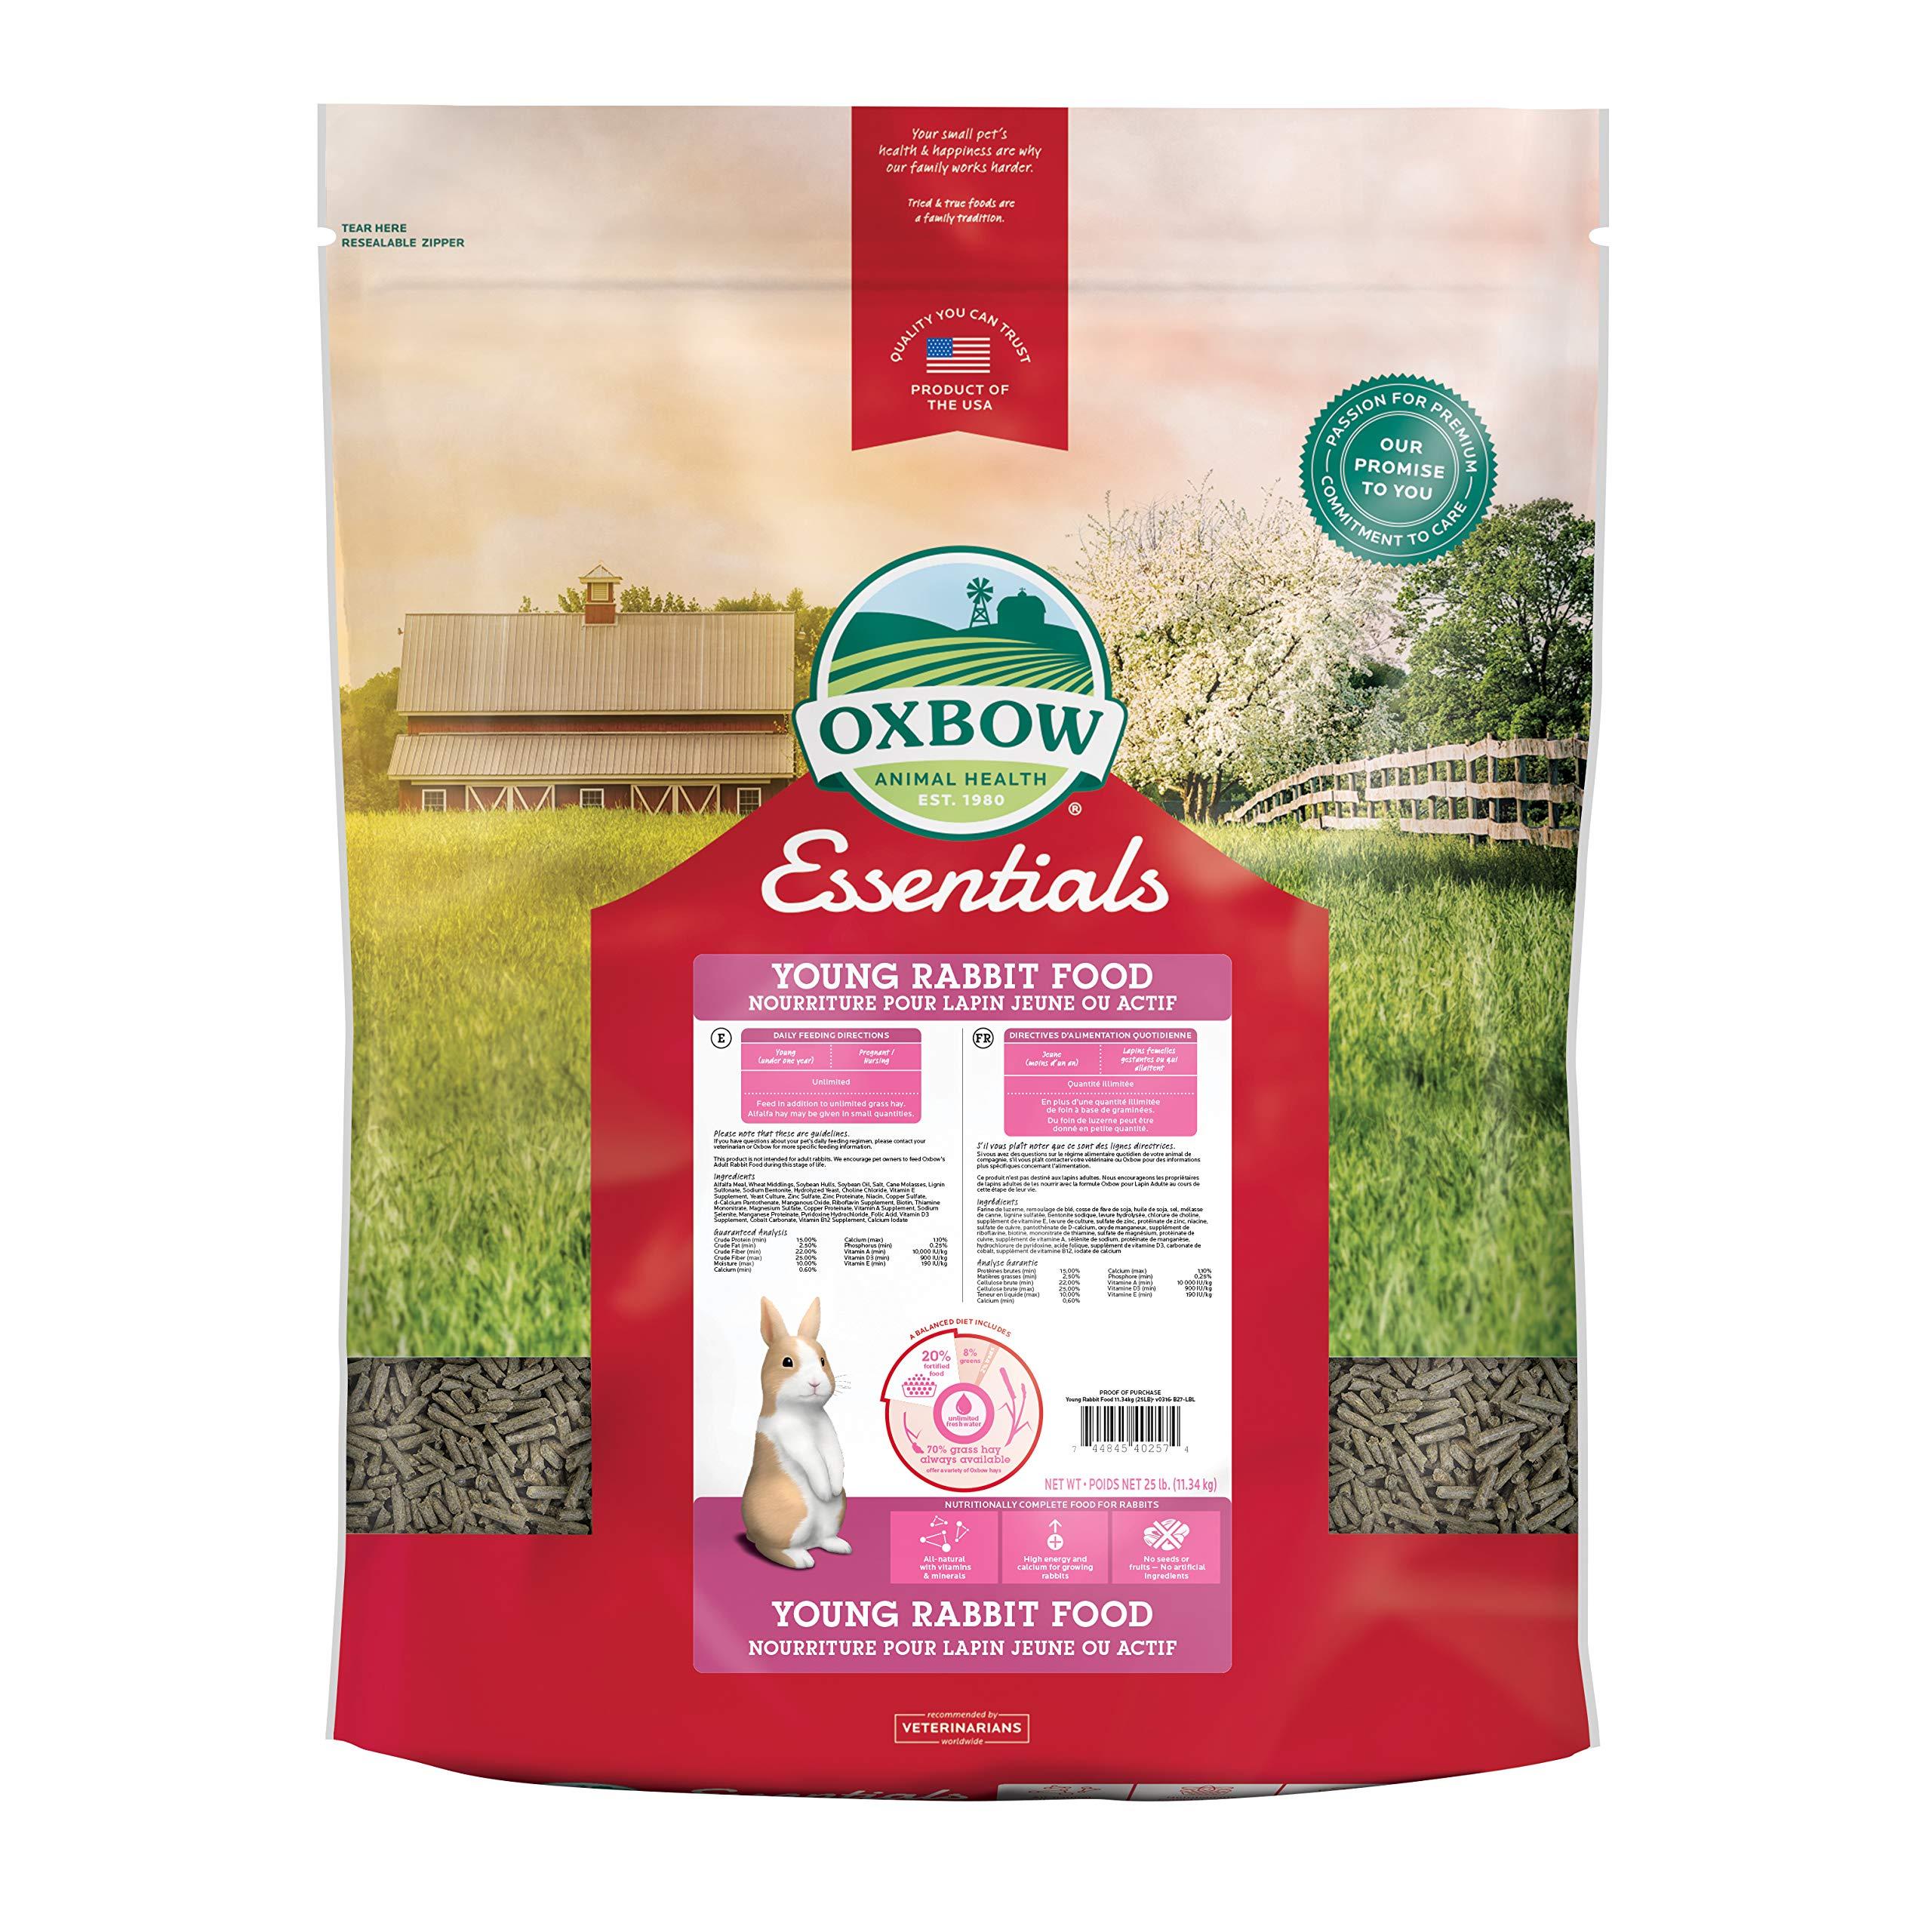 Oxbow Animal Health Bunny Basics Essentials Young Rabbit Food, 25-Pound by Oxbow Animal Health